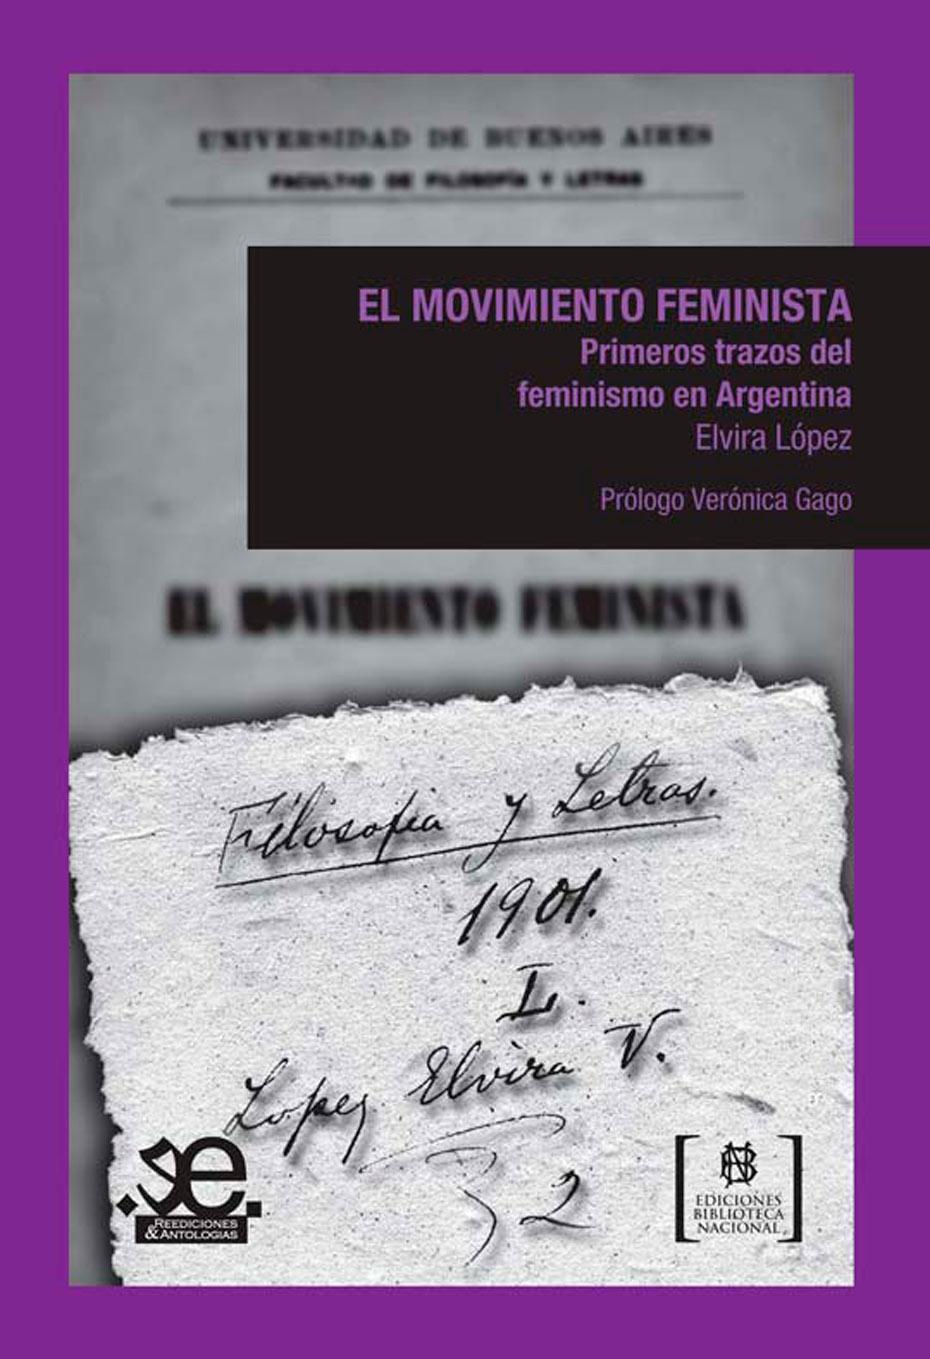 Perfil_feminista_der_02.jpg